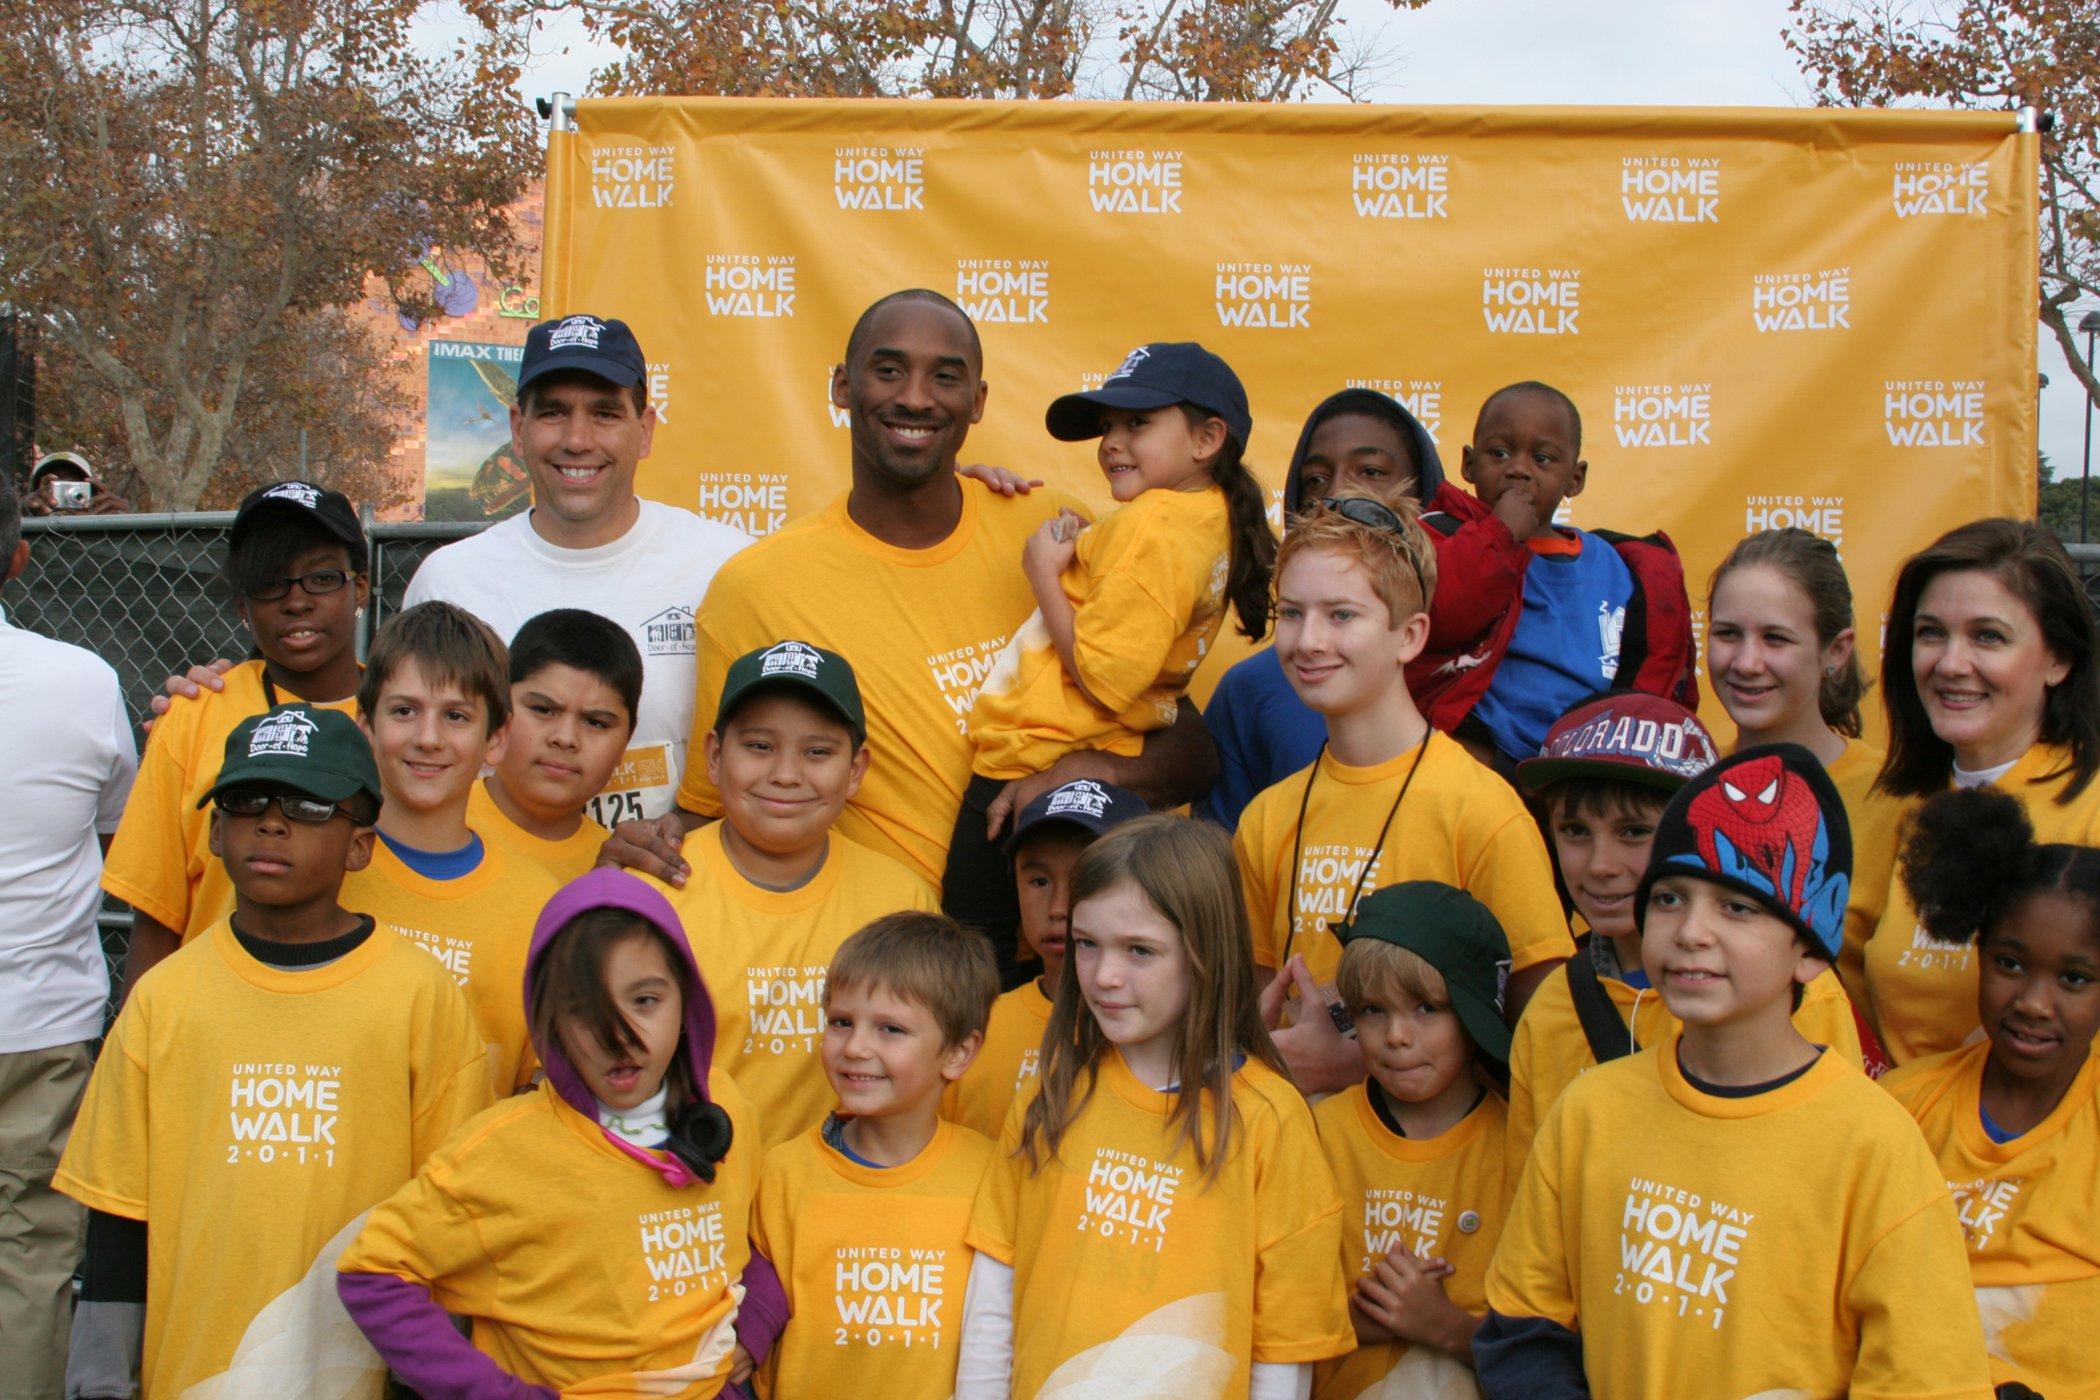 Kobe with Kids at HomeWalk